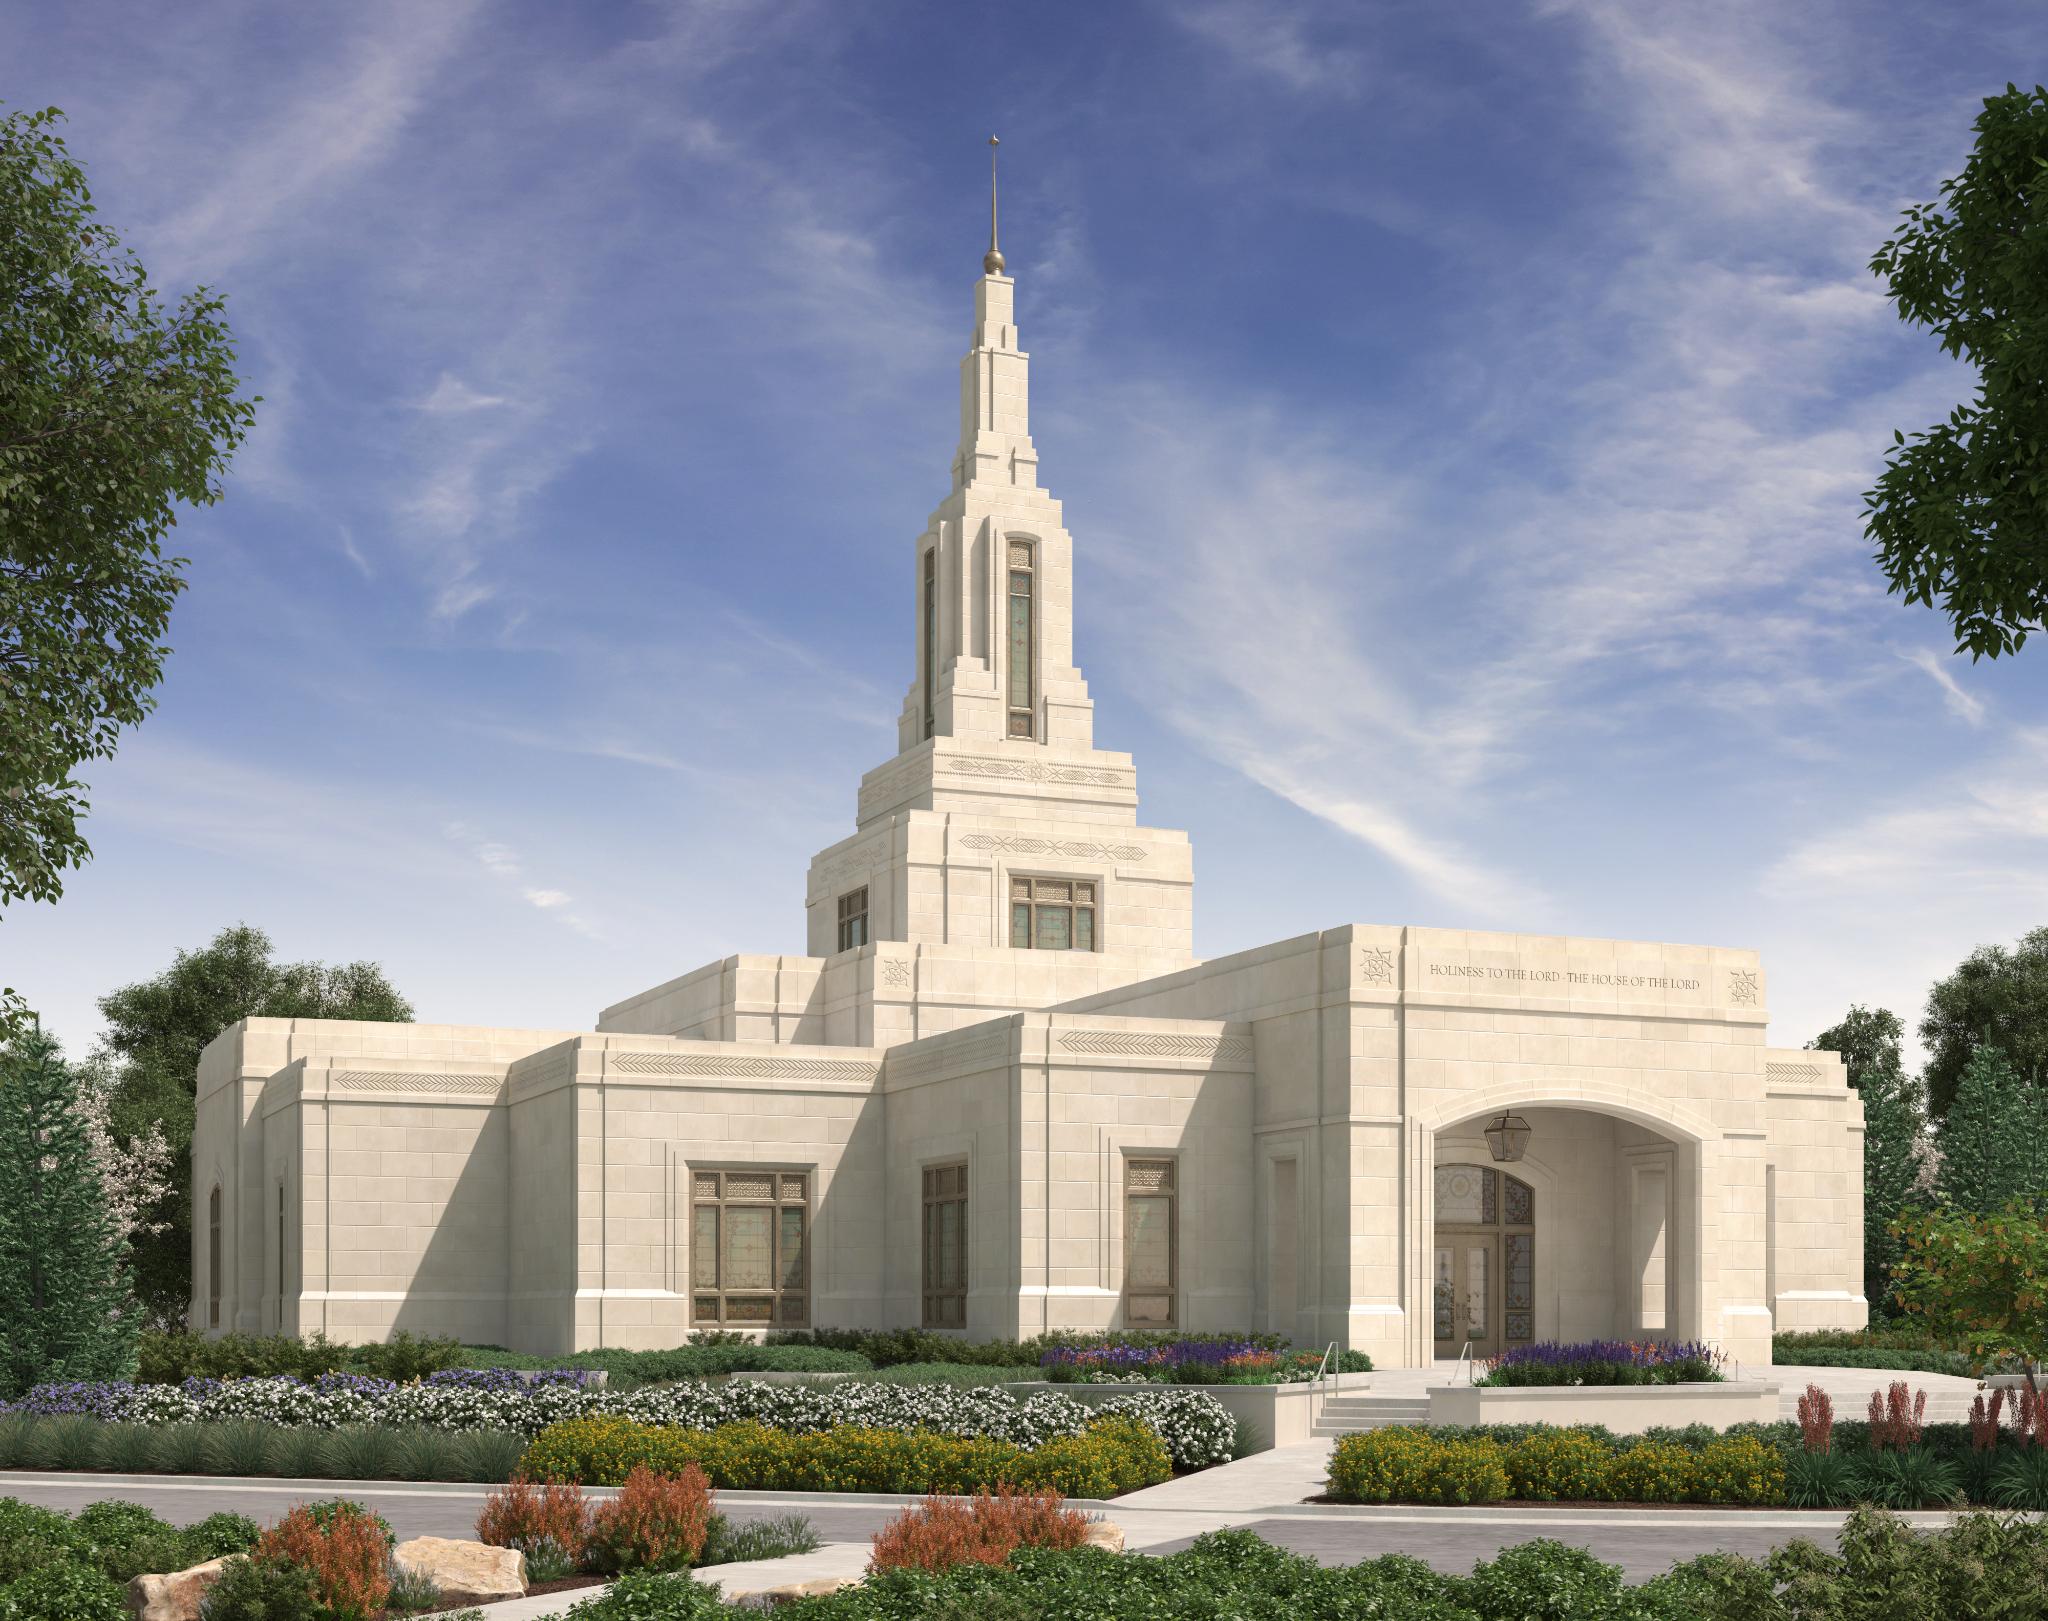 An artist's rendering of the Farmington New Mexico Temple.